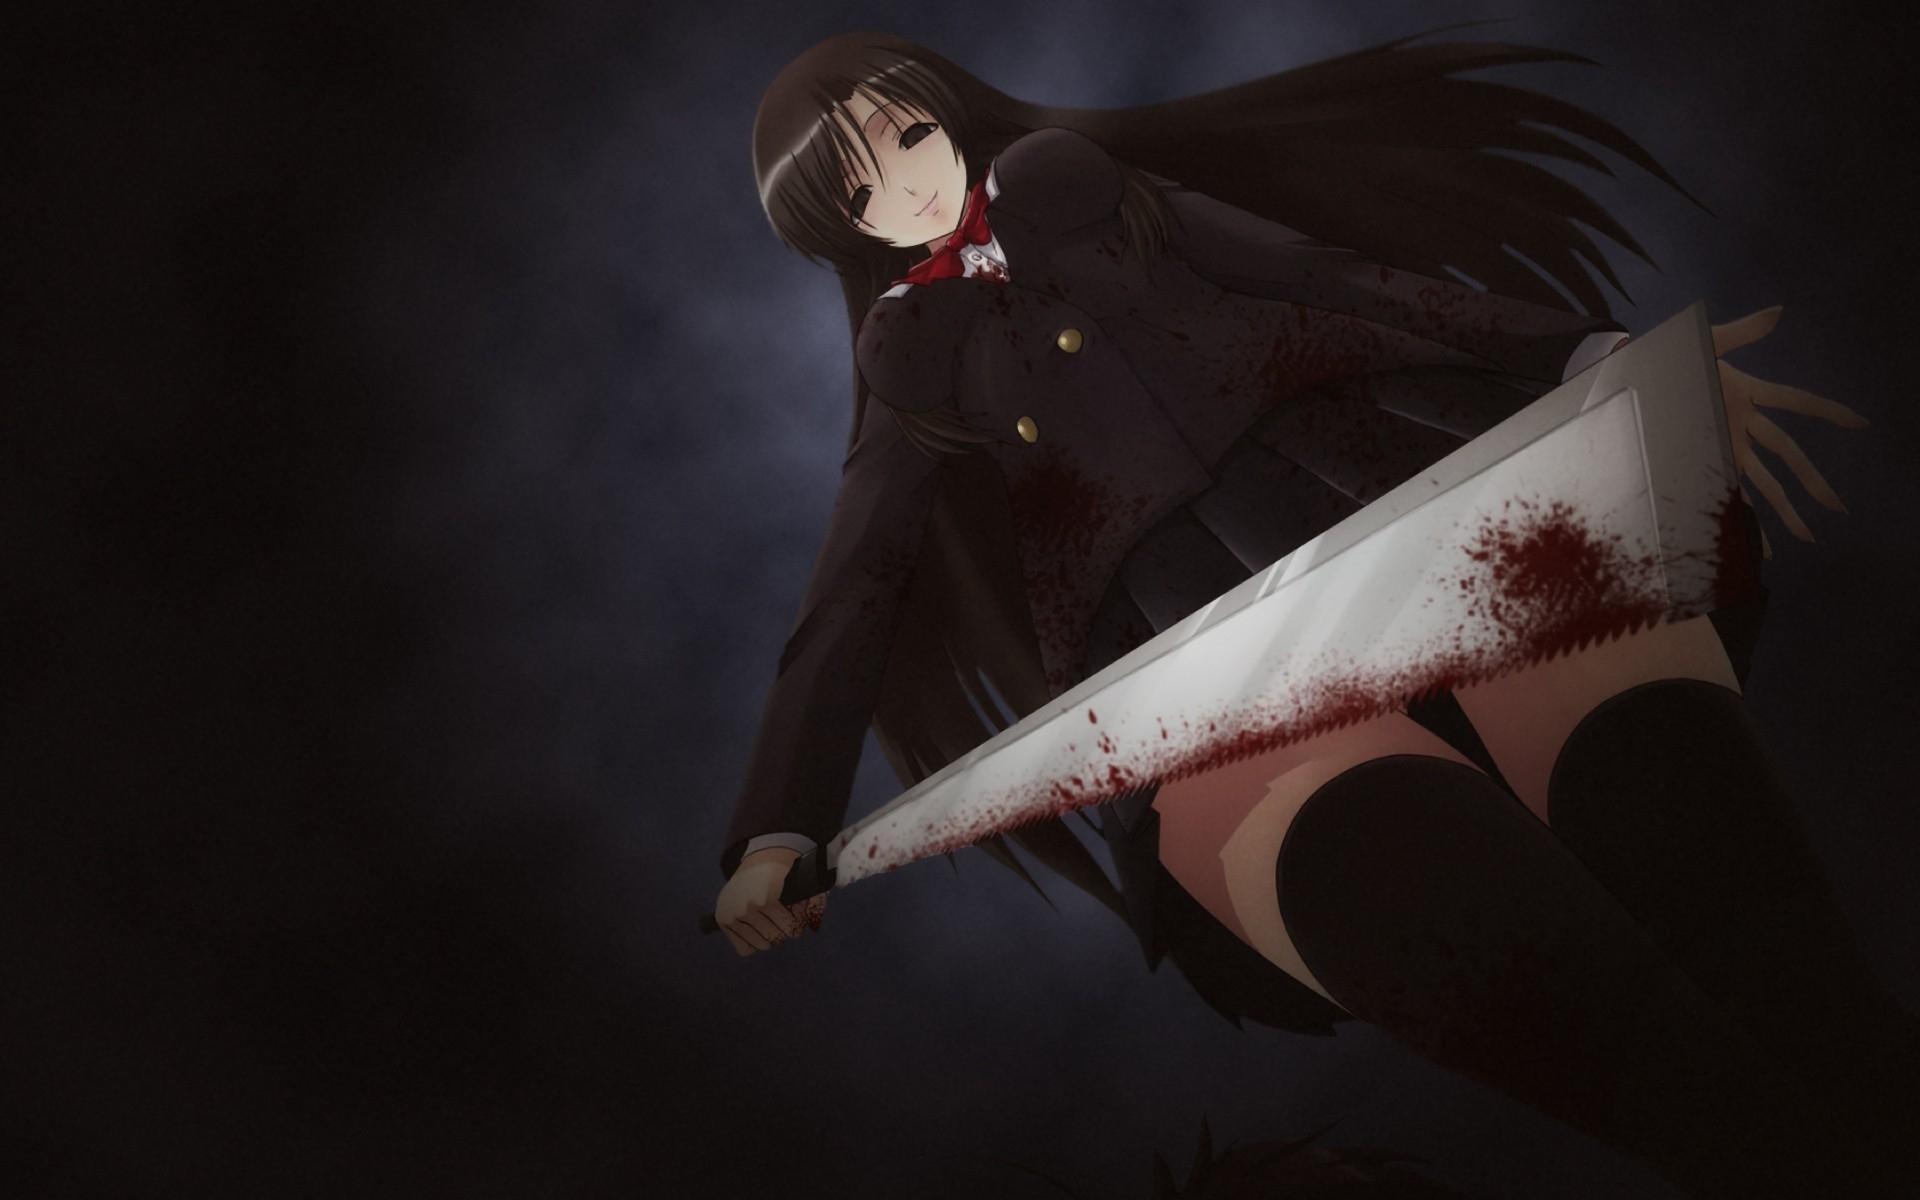 Wallpaper Anime Brunette Blood Girl Smile Darkness Wing